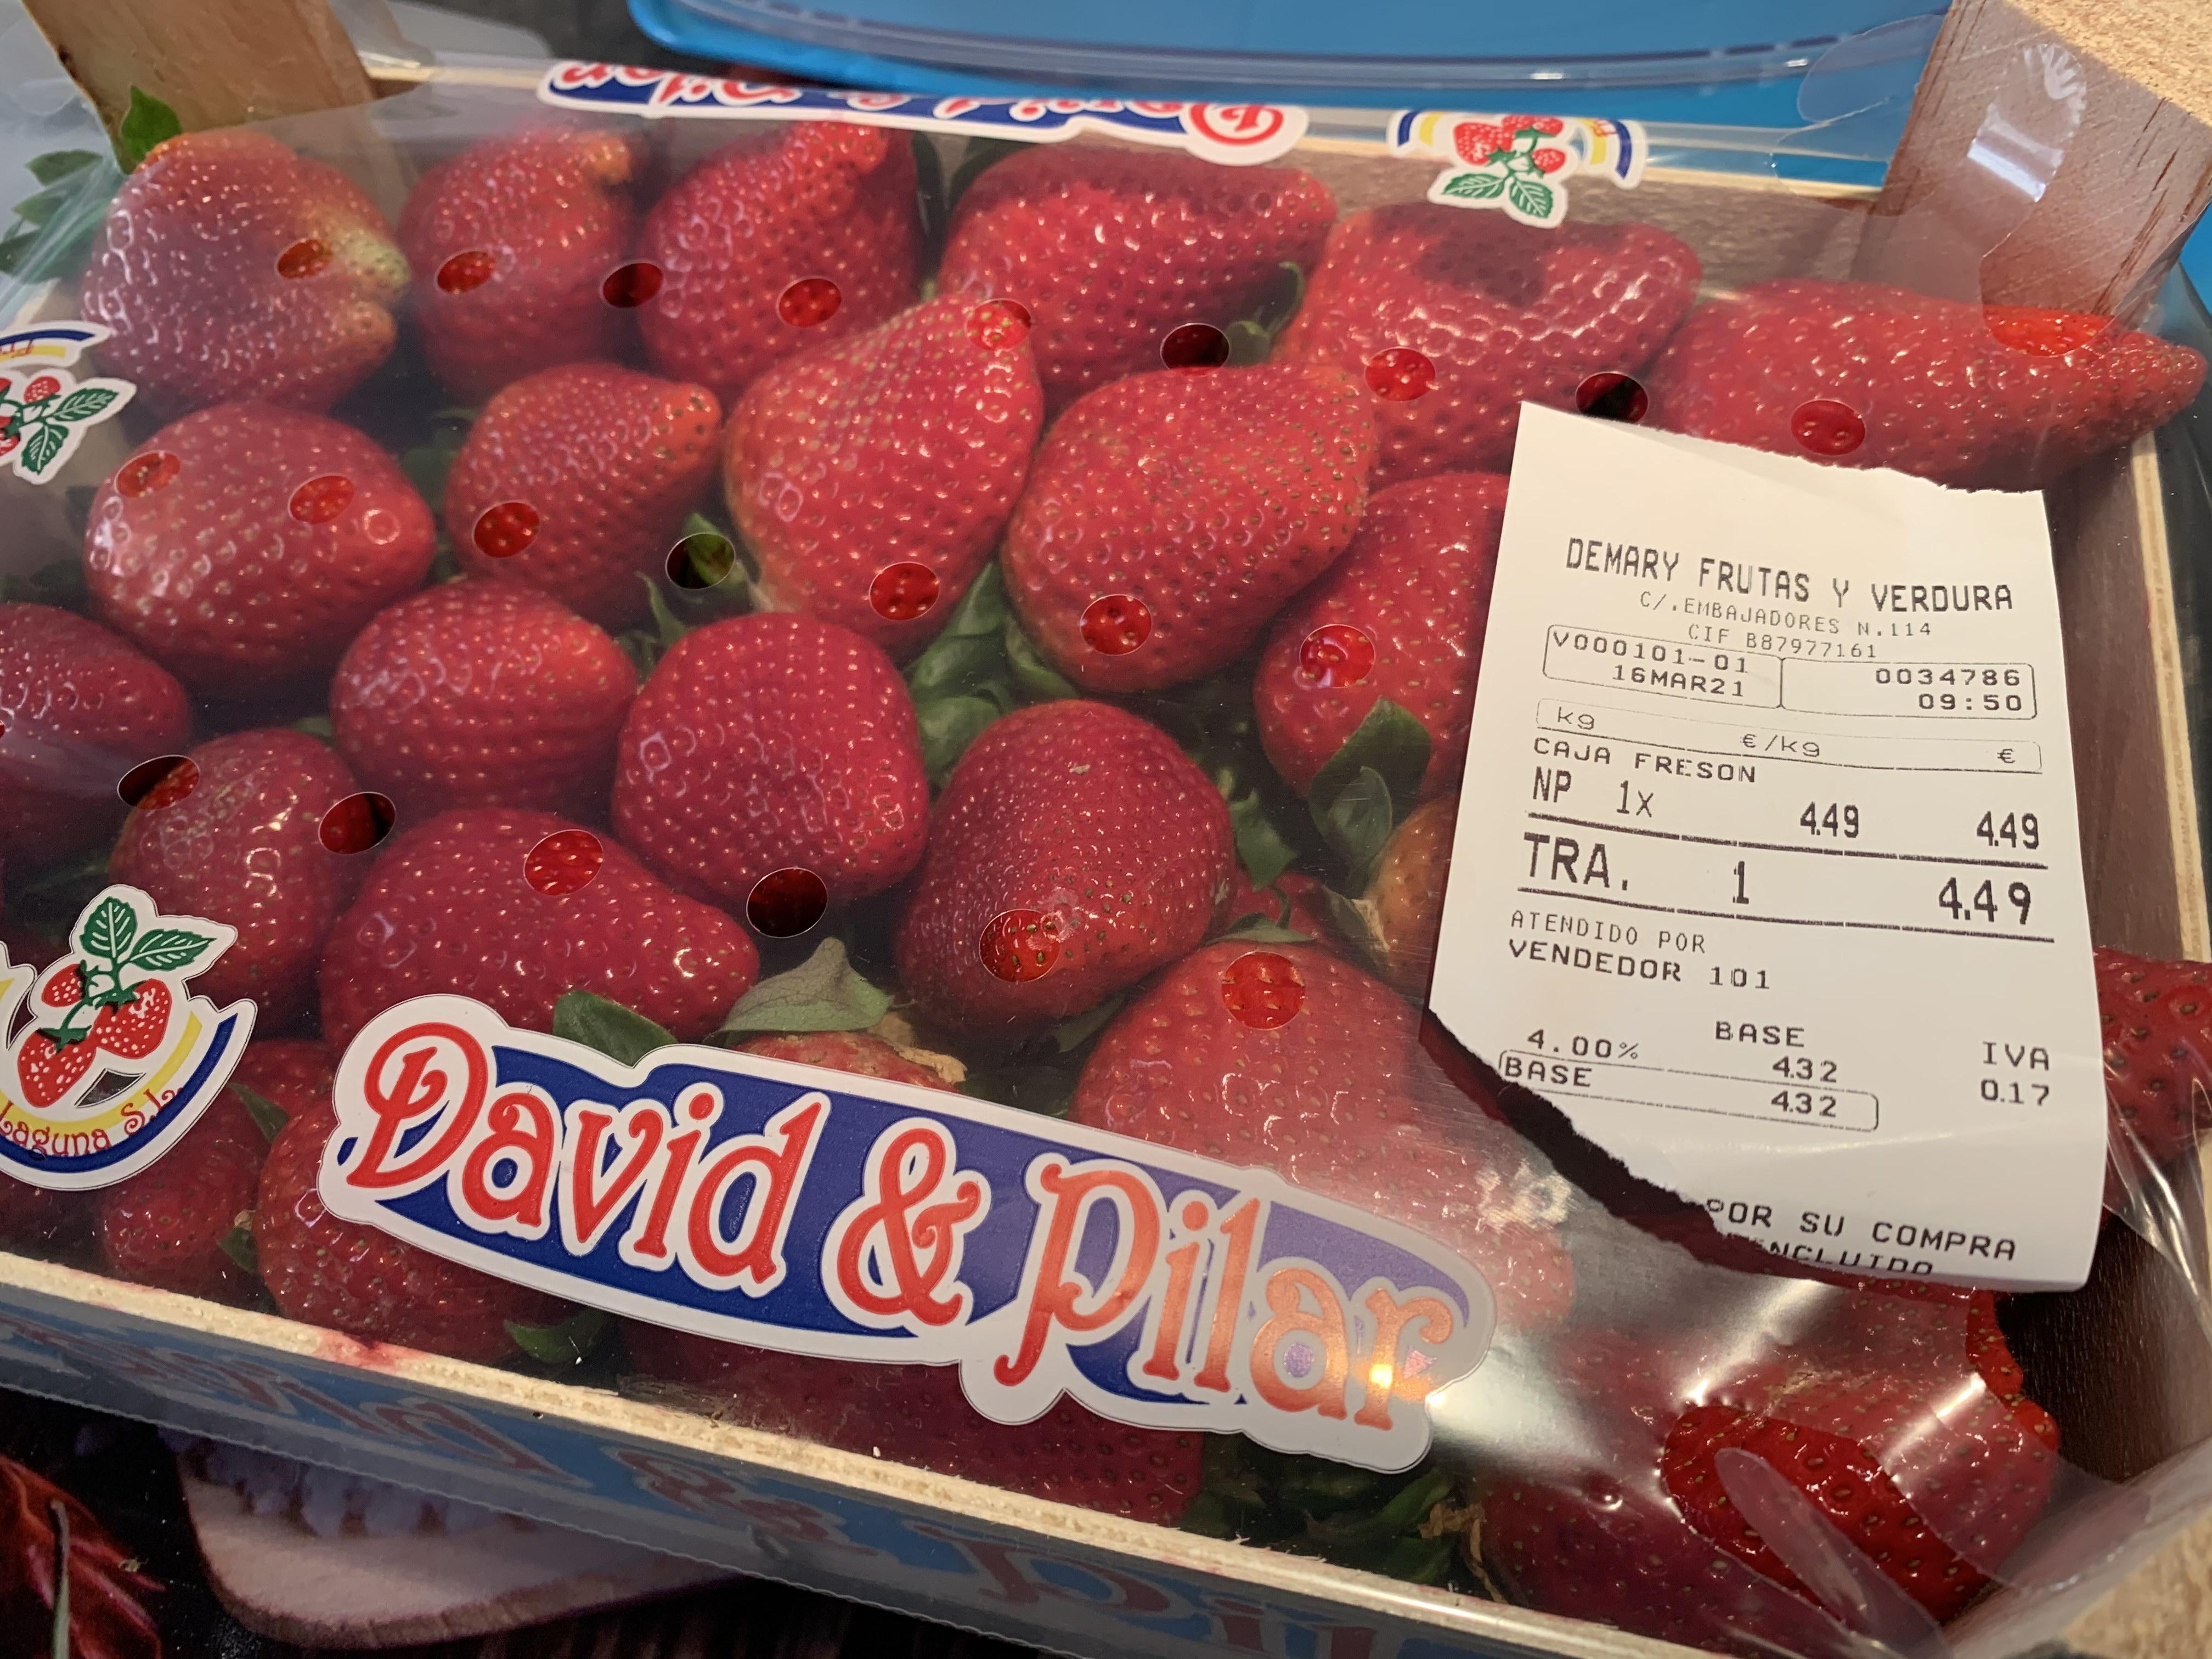 Caja de fresas 2KG a 4,49€